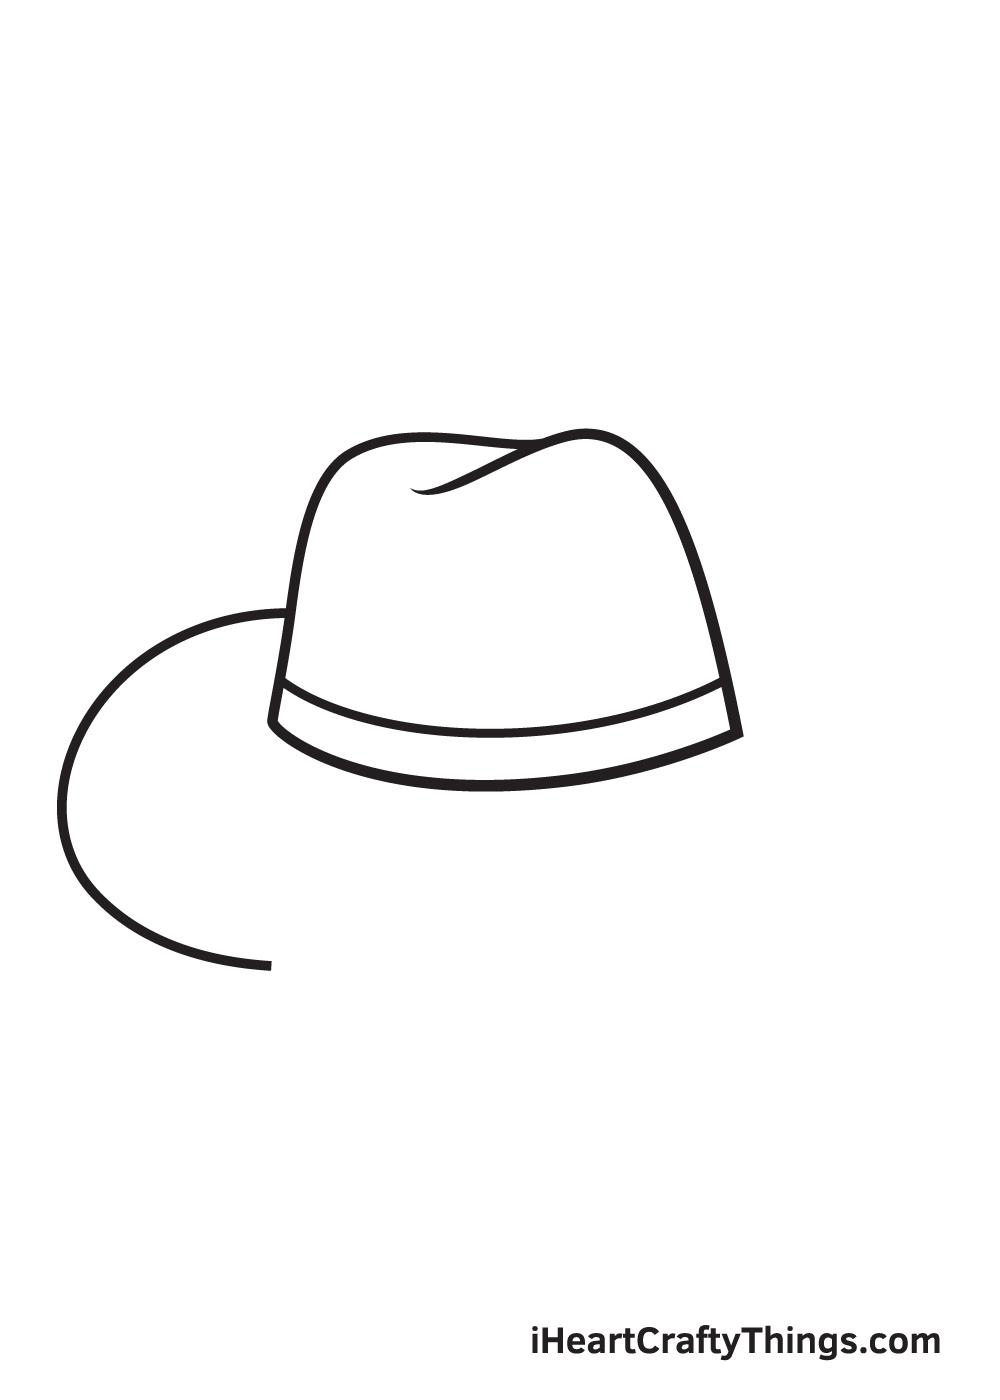 cowboy hat drawing - step 5